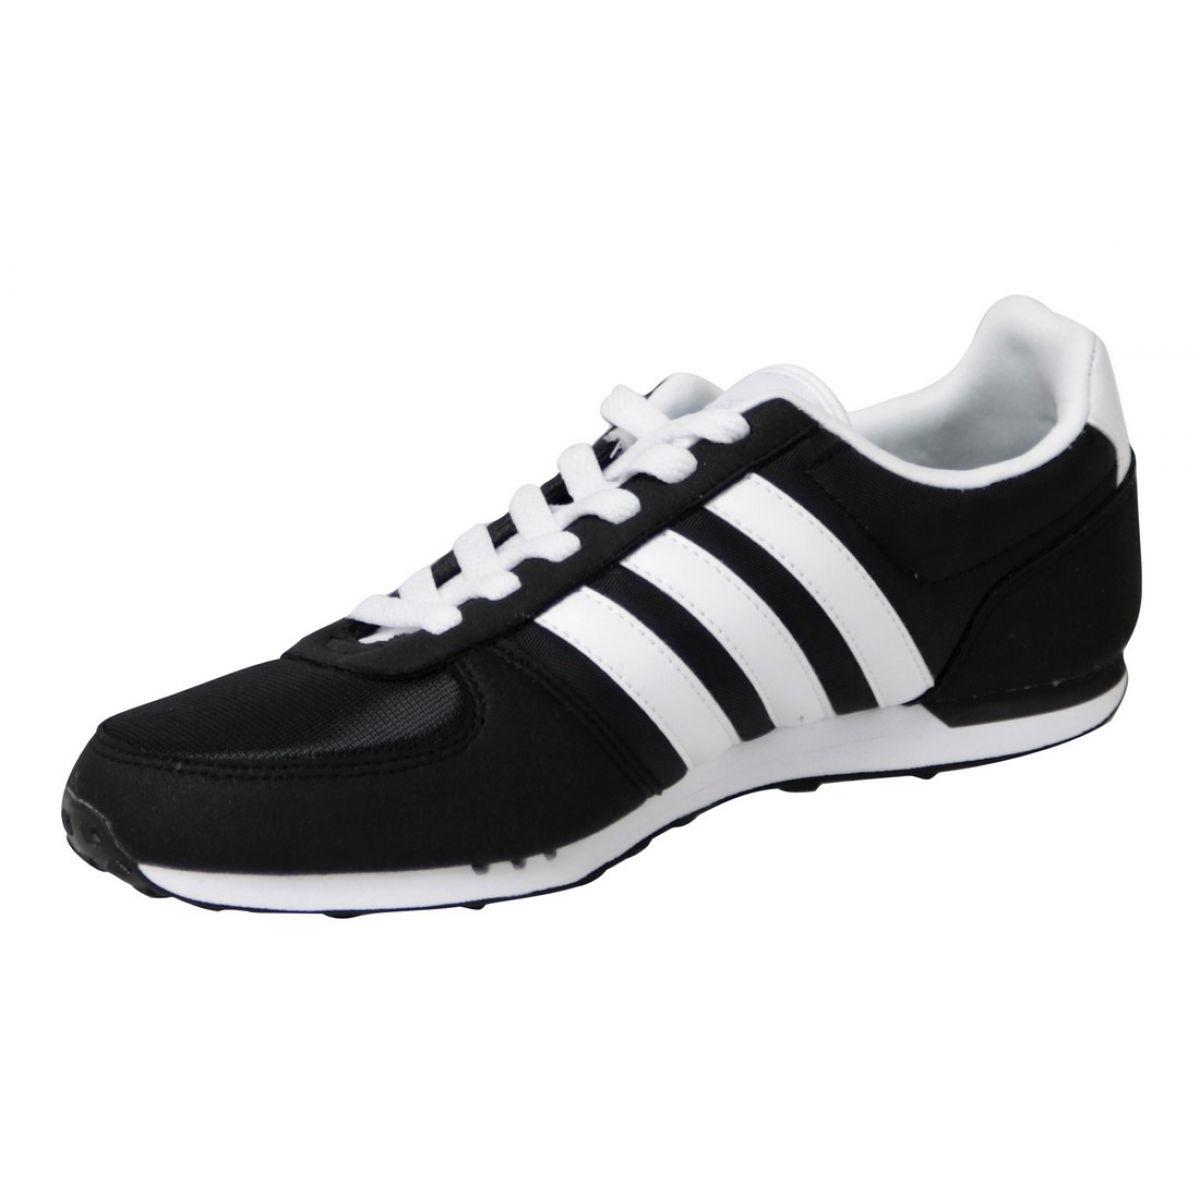 adidas Basket Adidas Neo City Racer F99329 Noir Chaussures